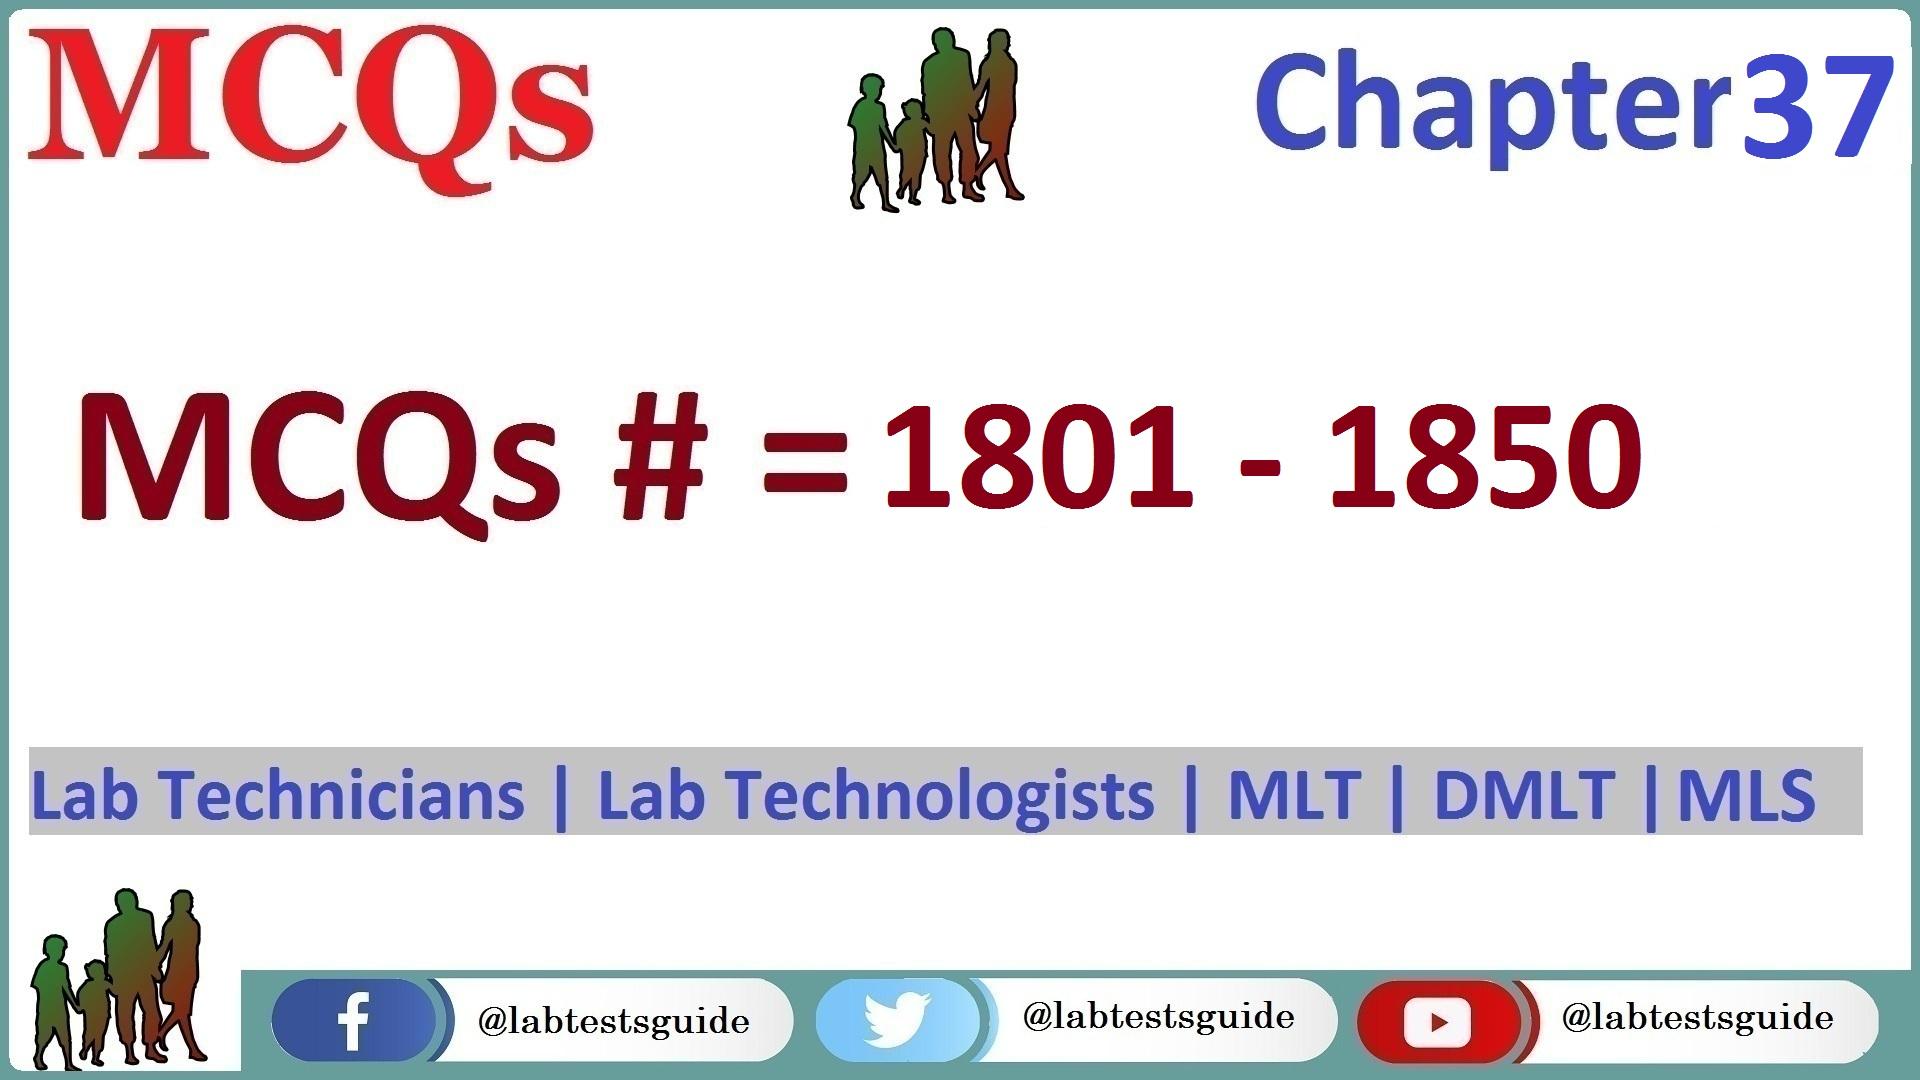 MCQs Chapter 37